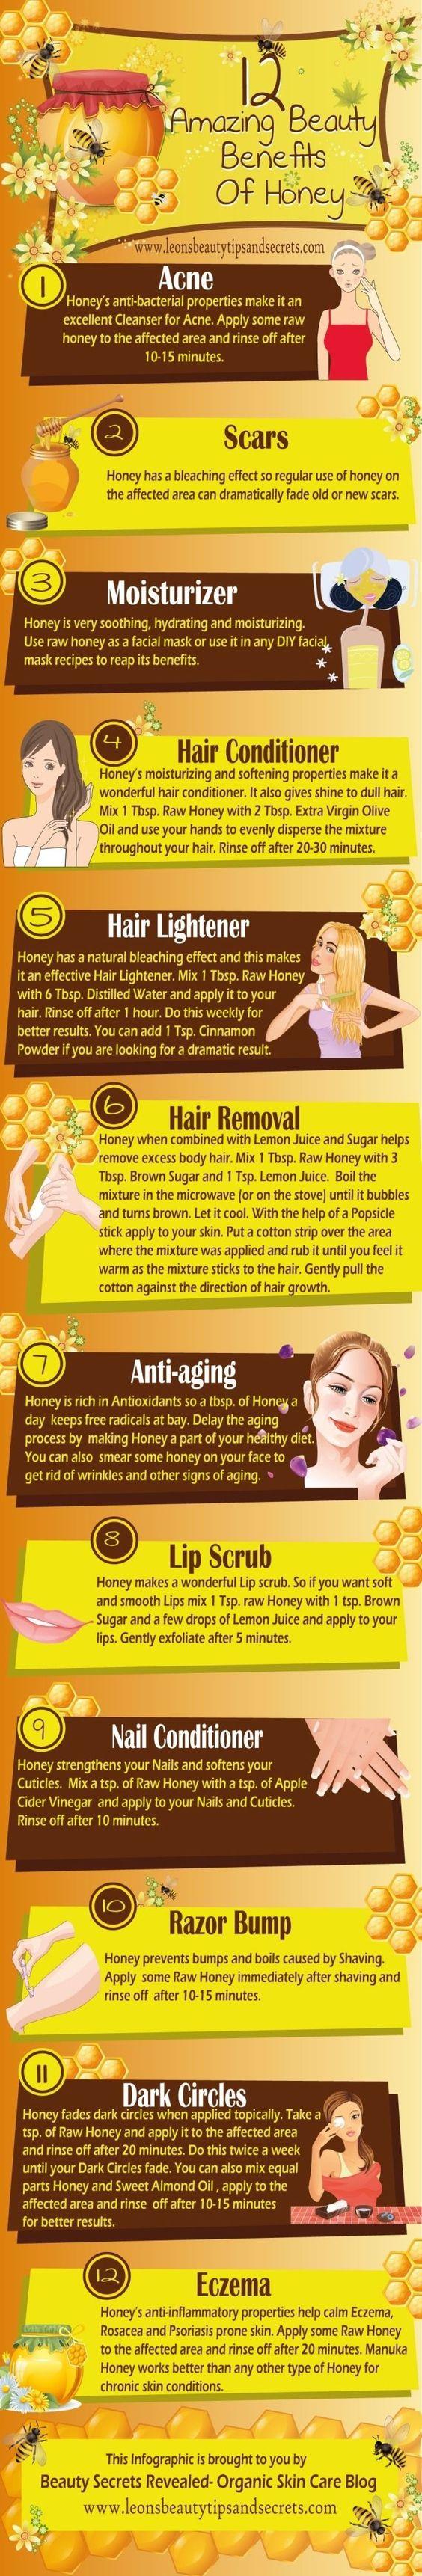 12 Beauty Benefits of Honey diy honey easy diy remedies home remedies acne remedies beauty remedy skin treatment hair treatments